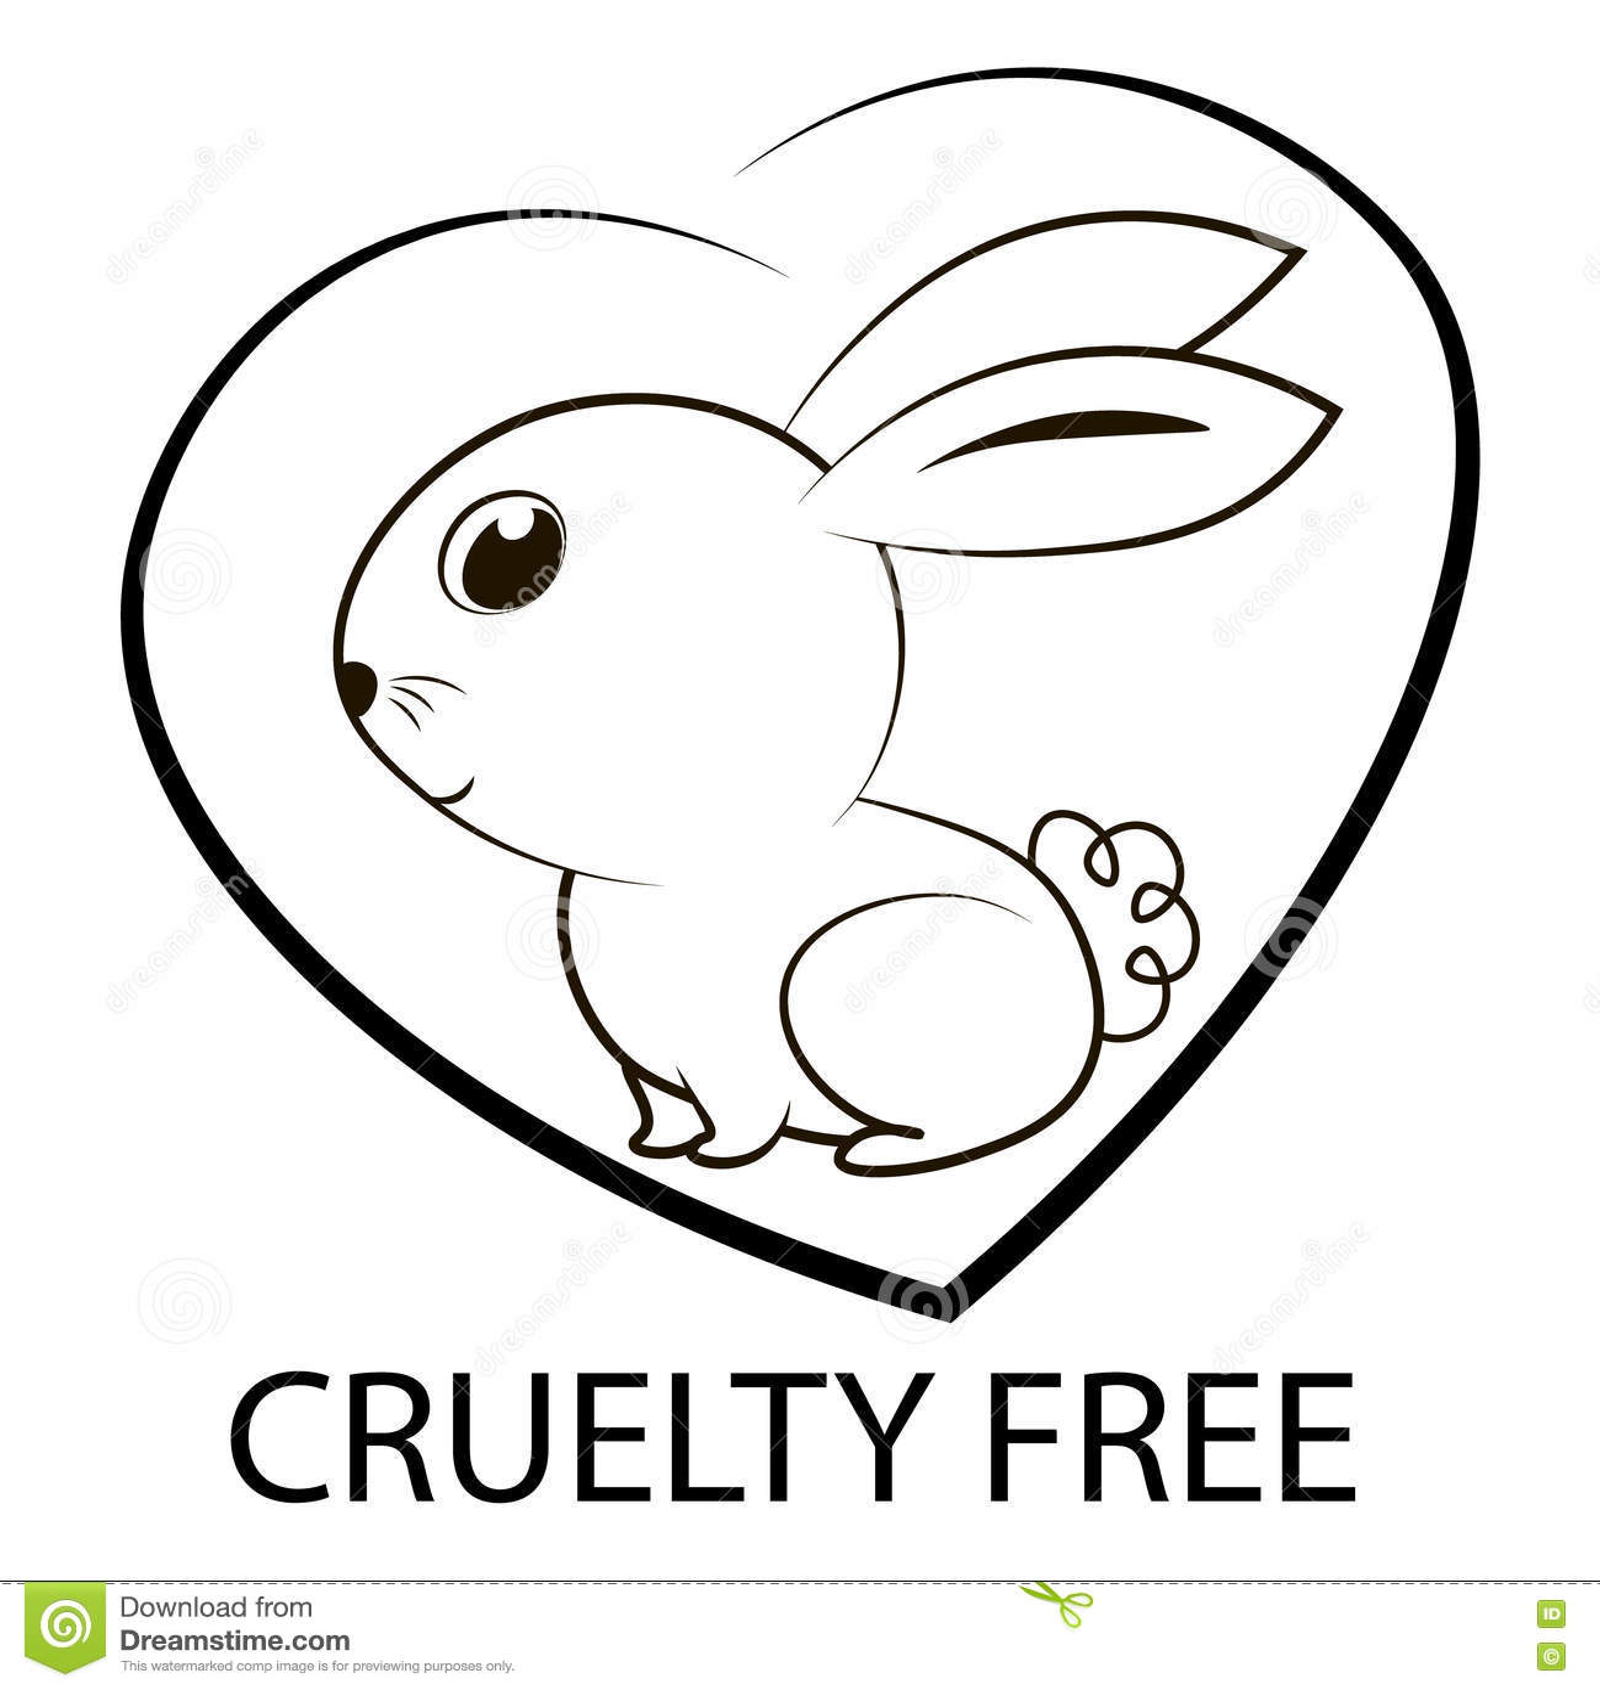 Animal Cruelty Free Icon Design Stock Illustration Illustration